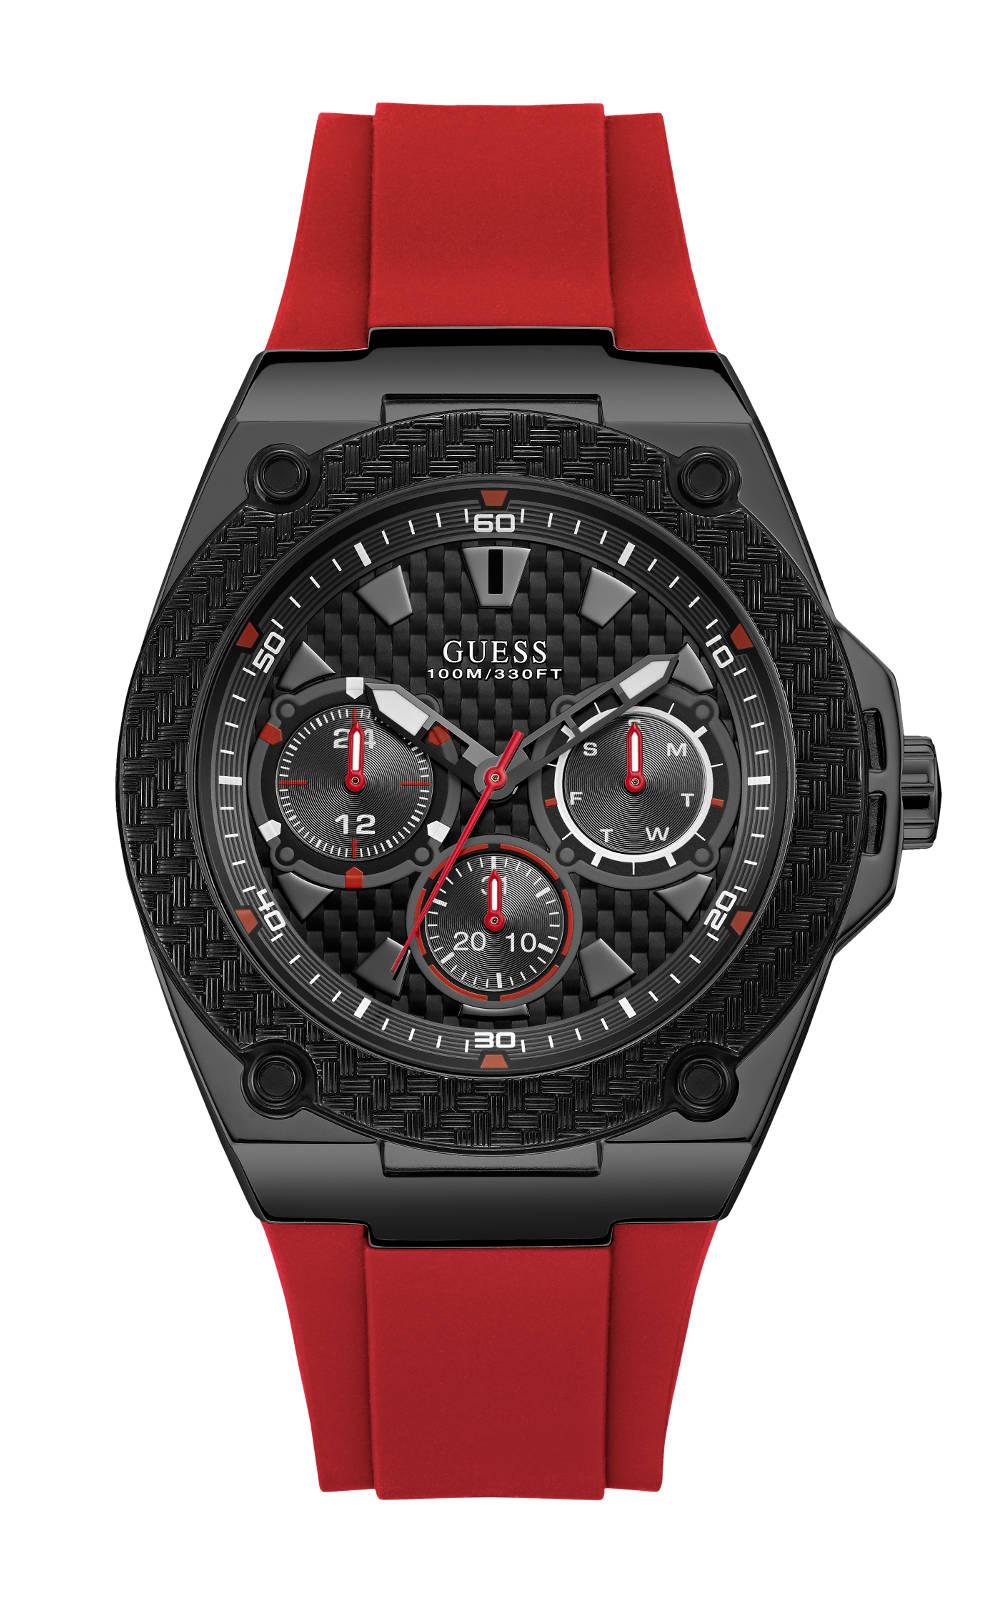 GUESS W1049G6 Ανδρικό Ρολόι Quartz Multi-Function 2d315e1e9d0